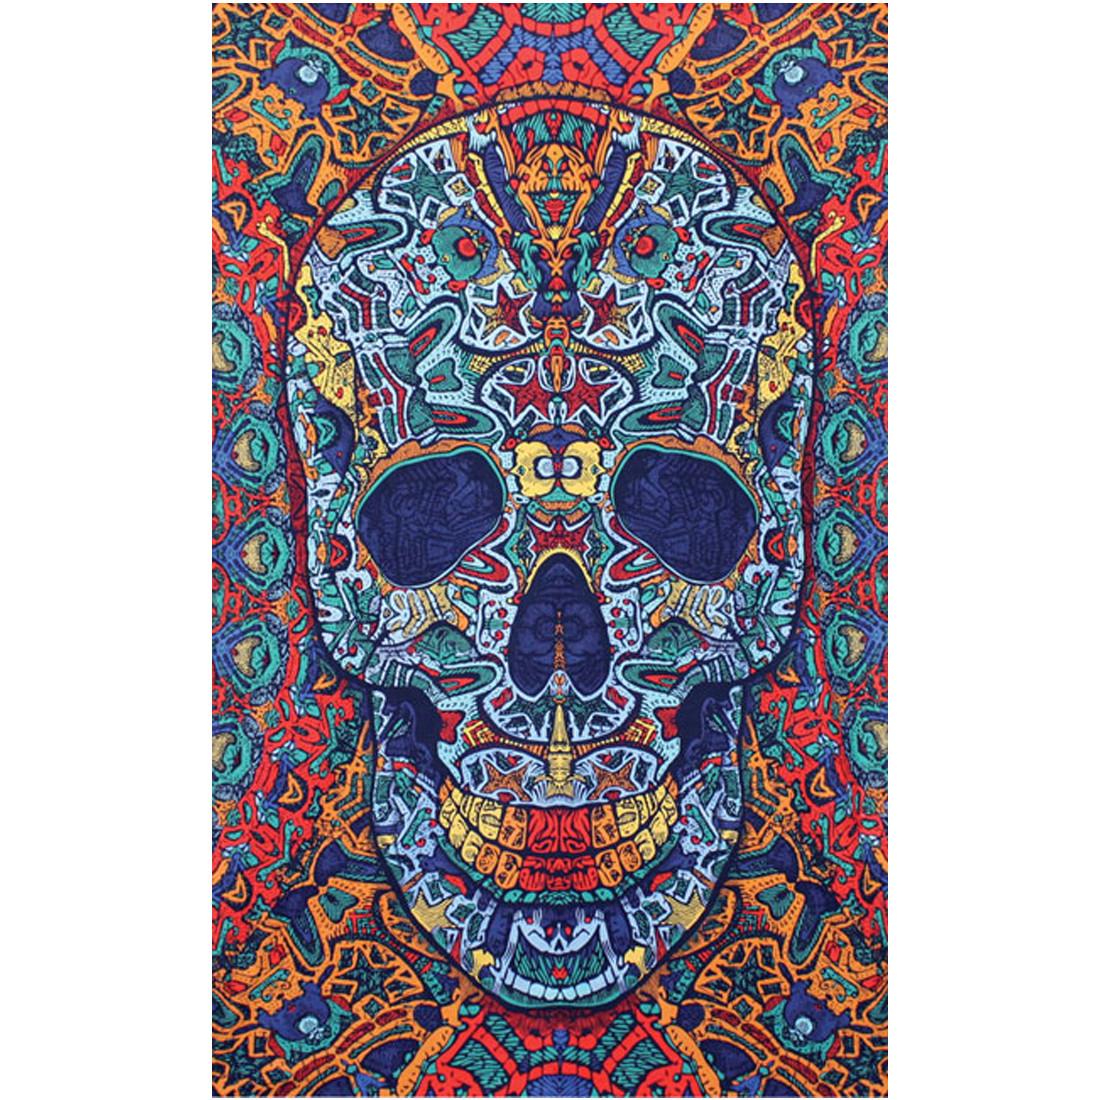 3D Skull Tapestry